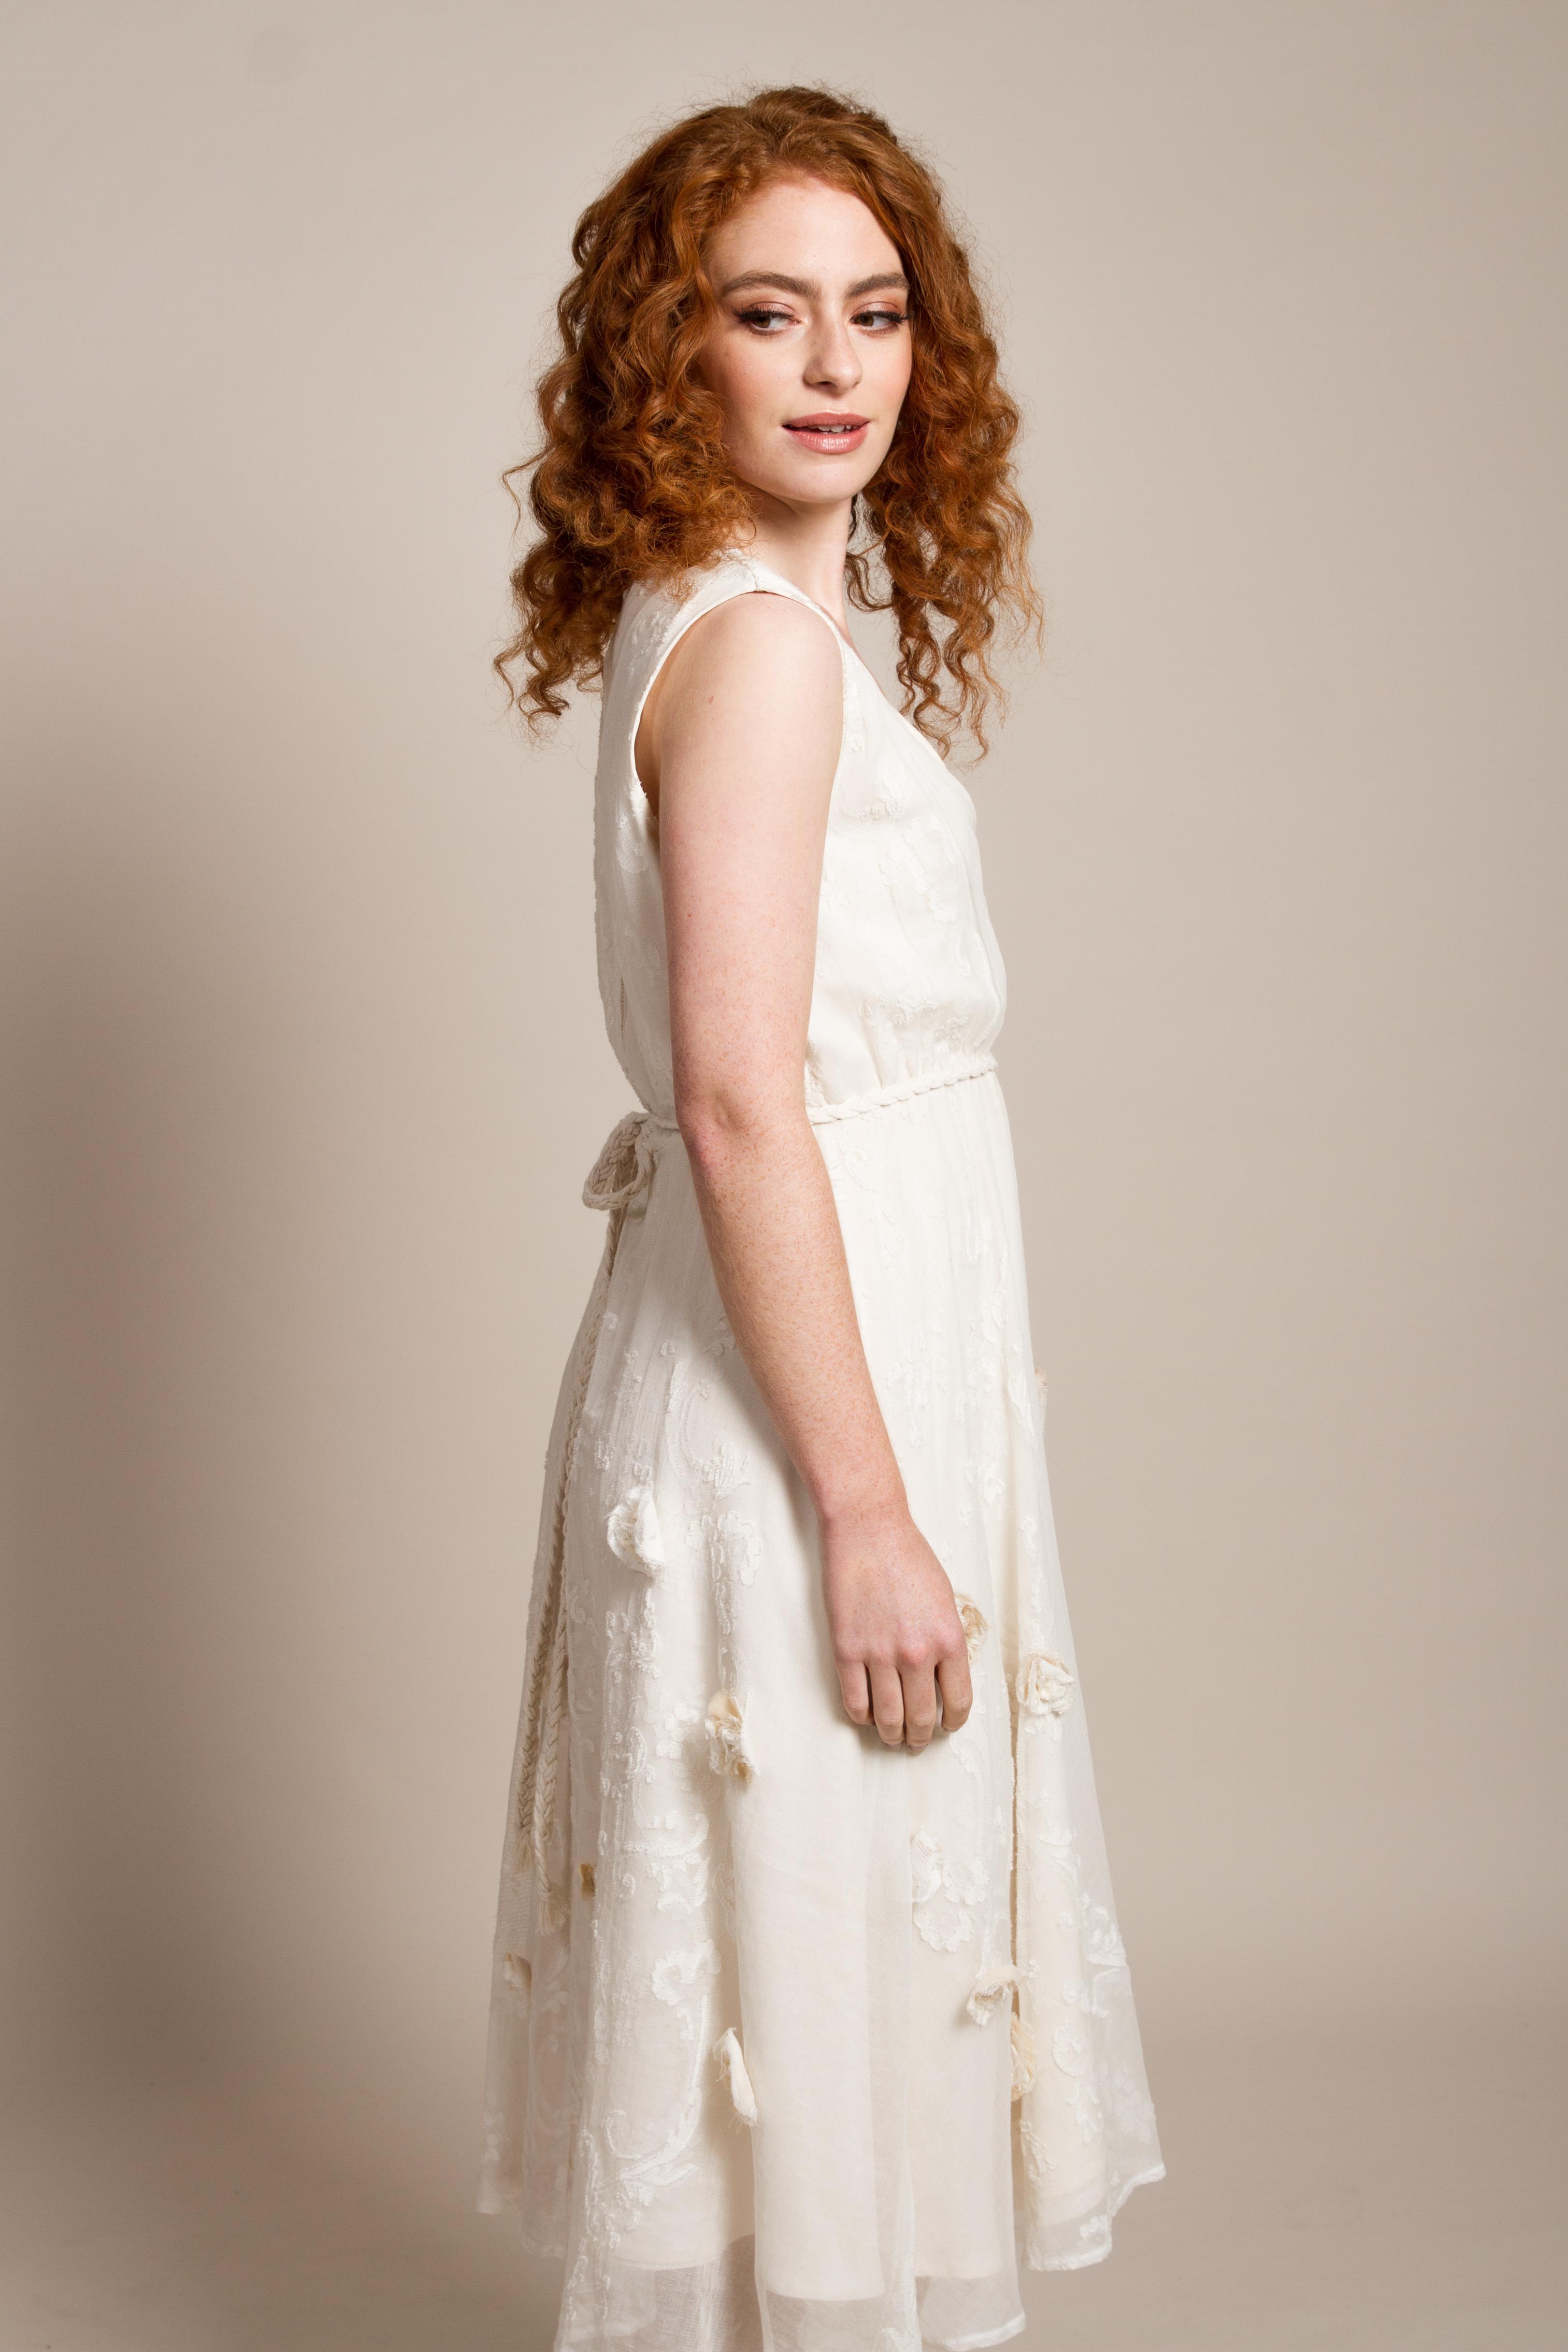 romantic-boho-bridal-style-long-hair-london